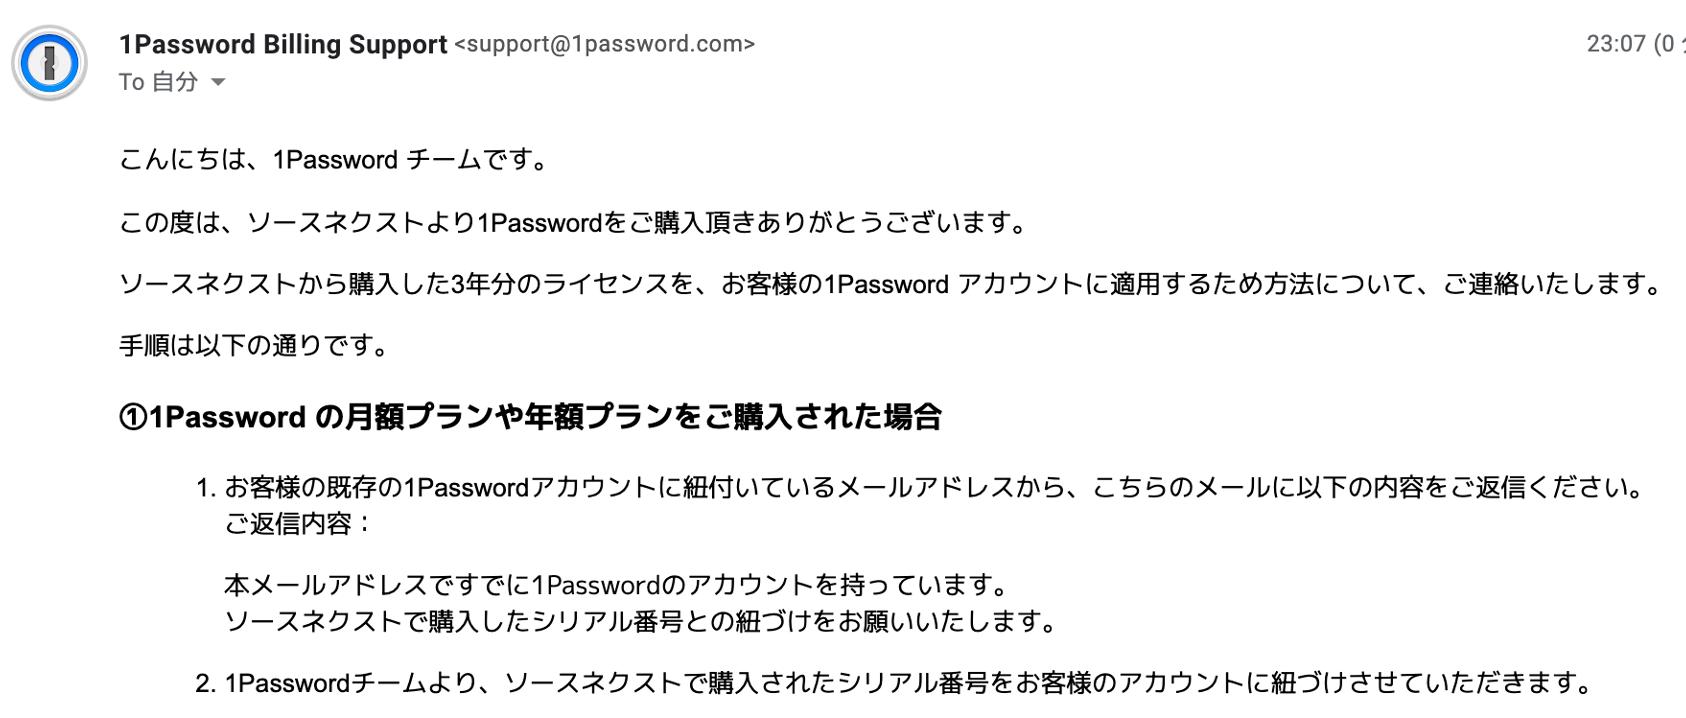 1passwordリンク画面7